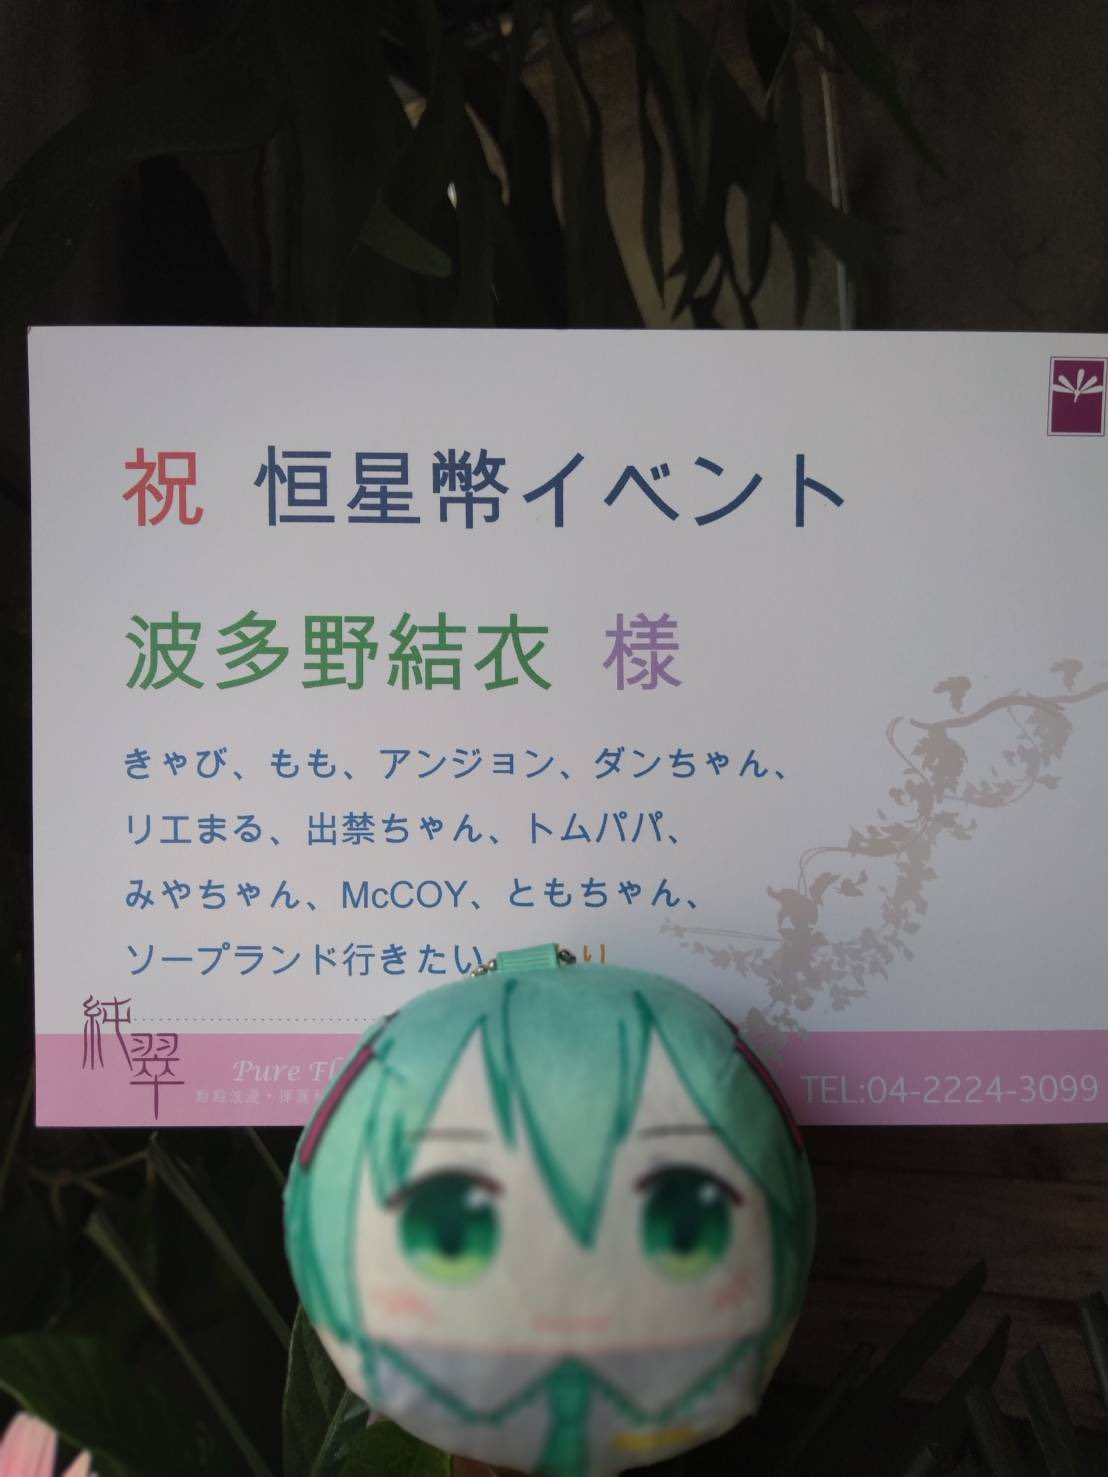 hatano_yui 1187987151658467329_p1